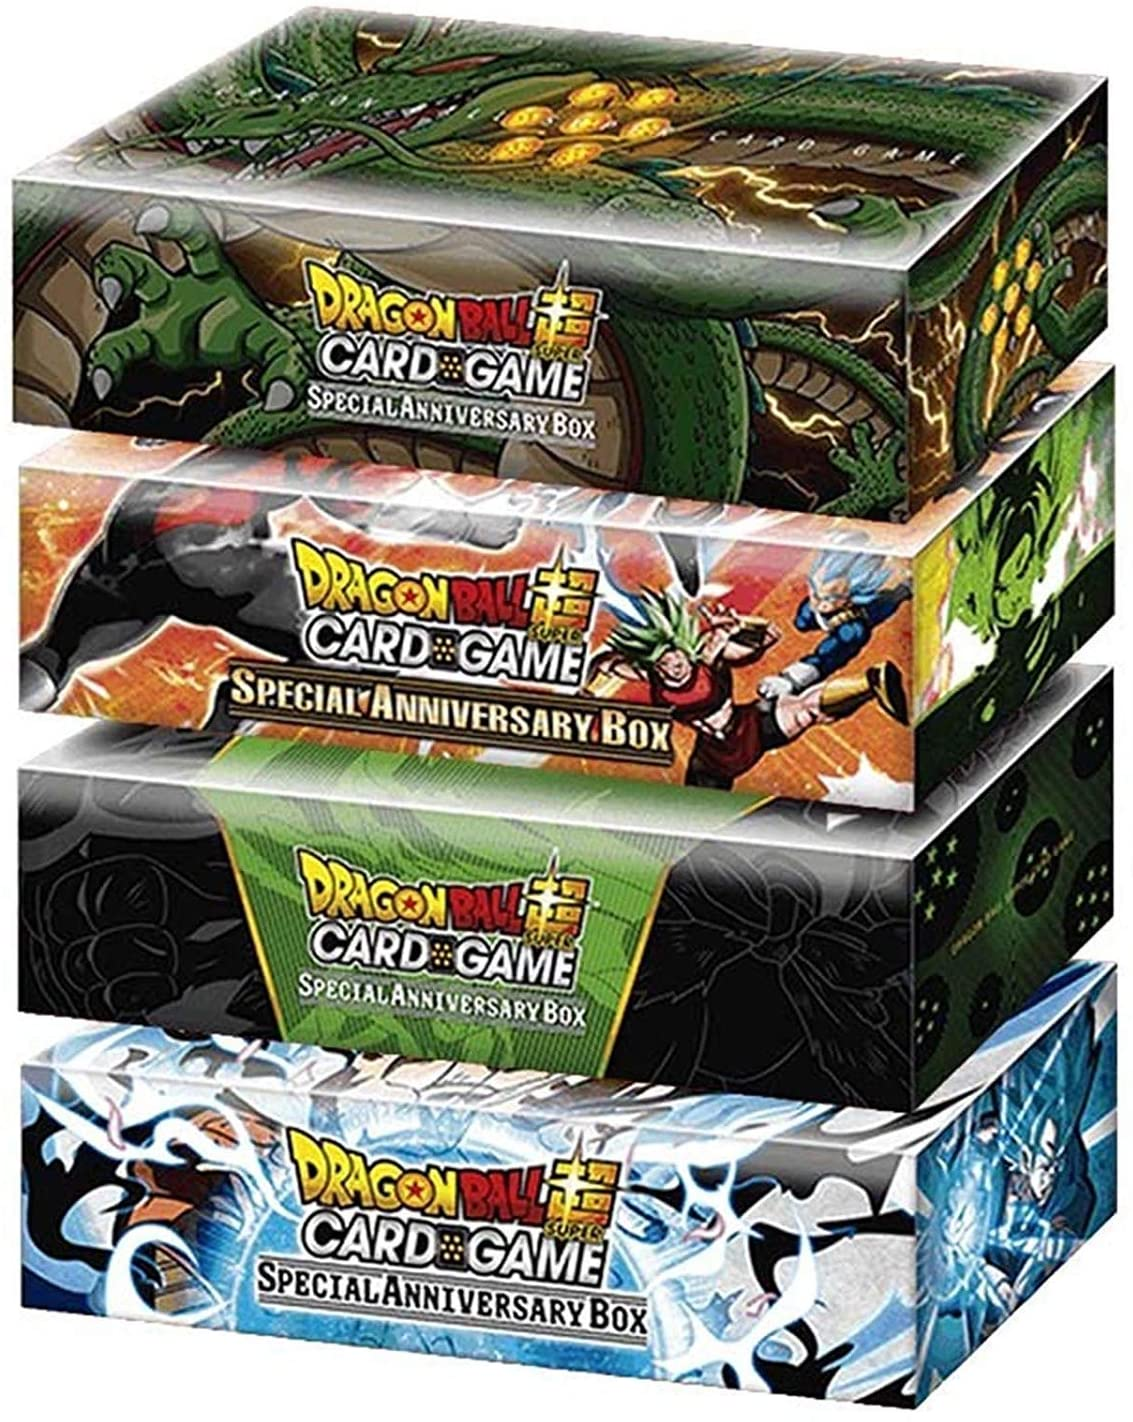 Dragon Ball Super Card Game Special Anniversary Box